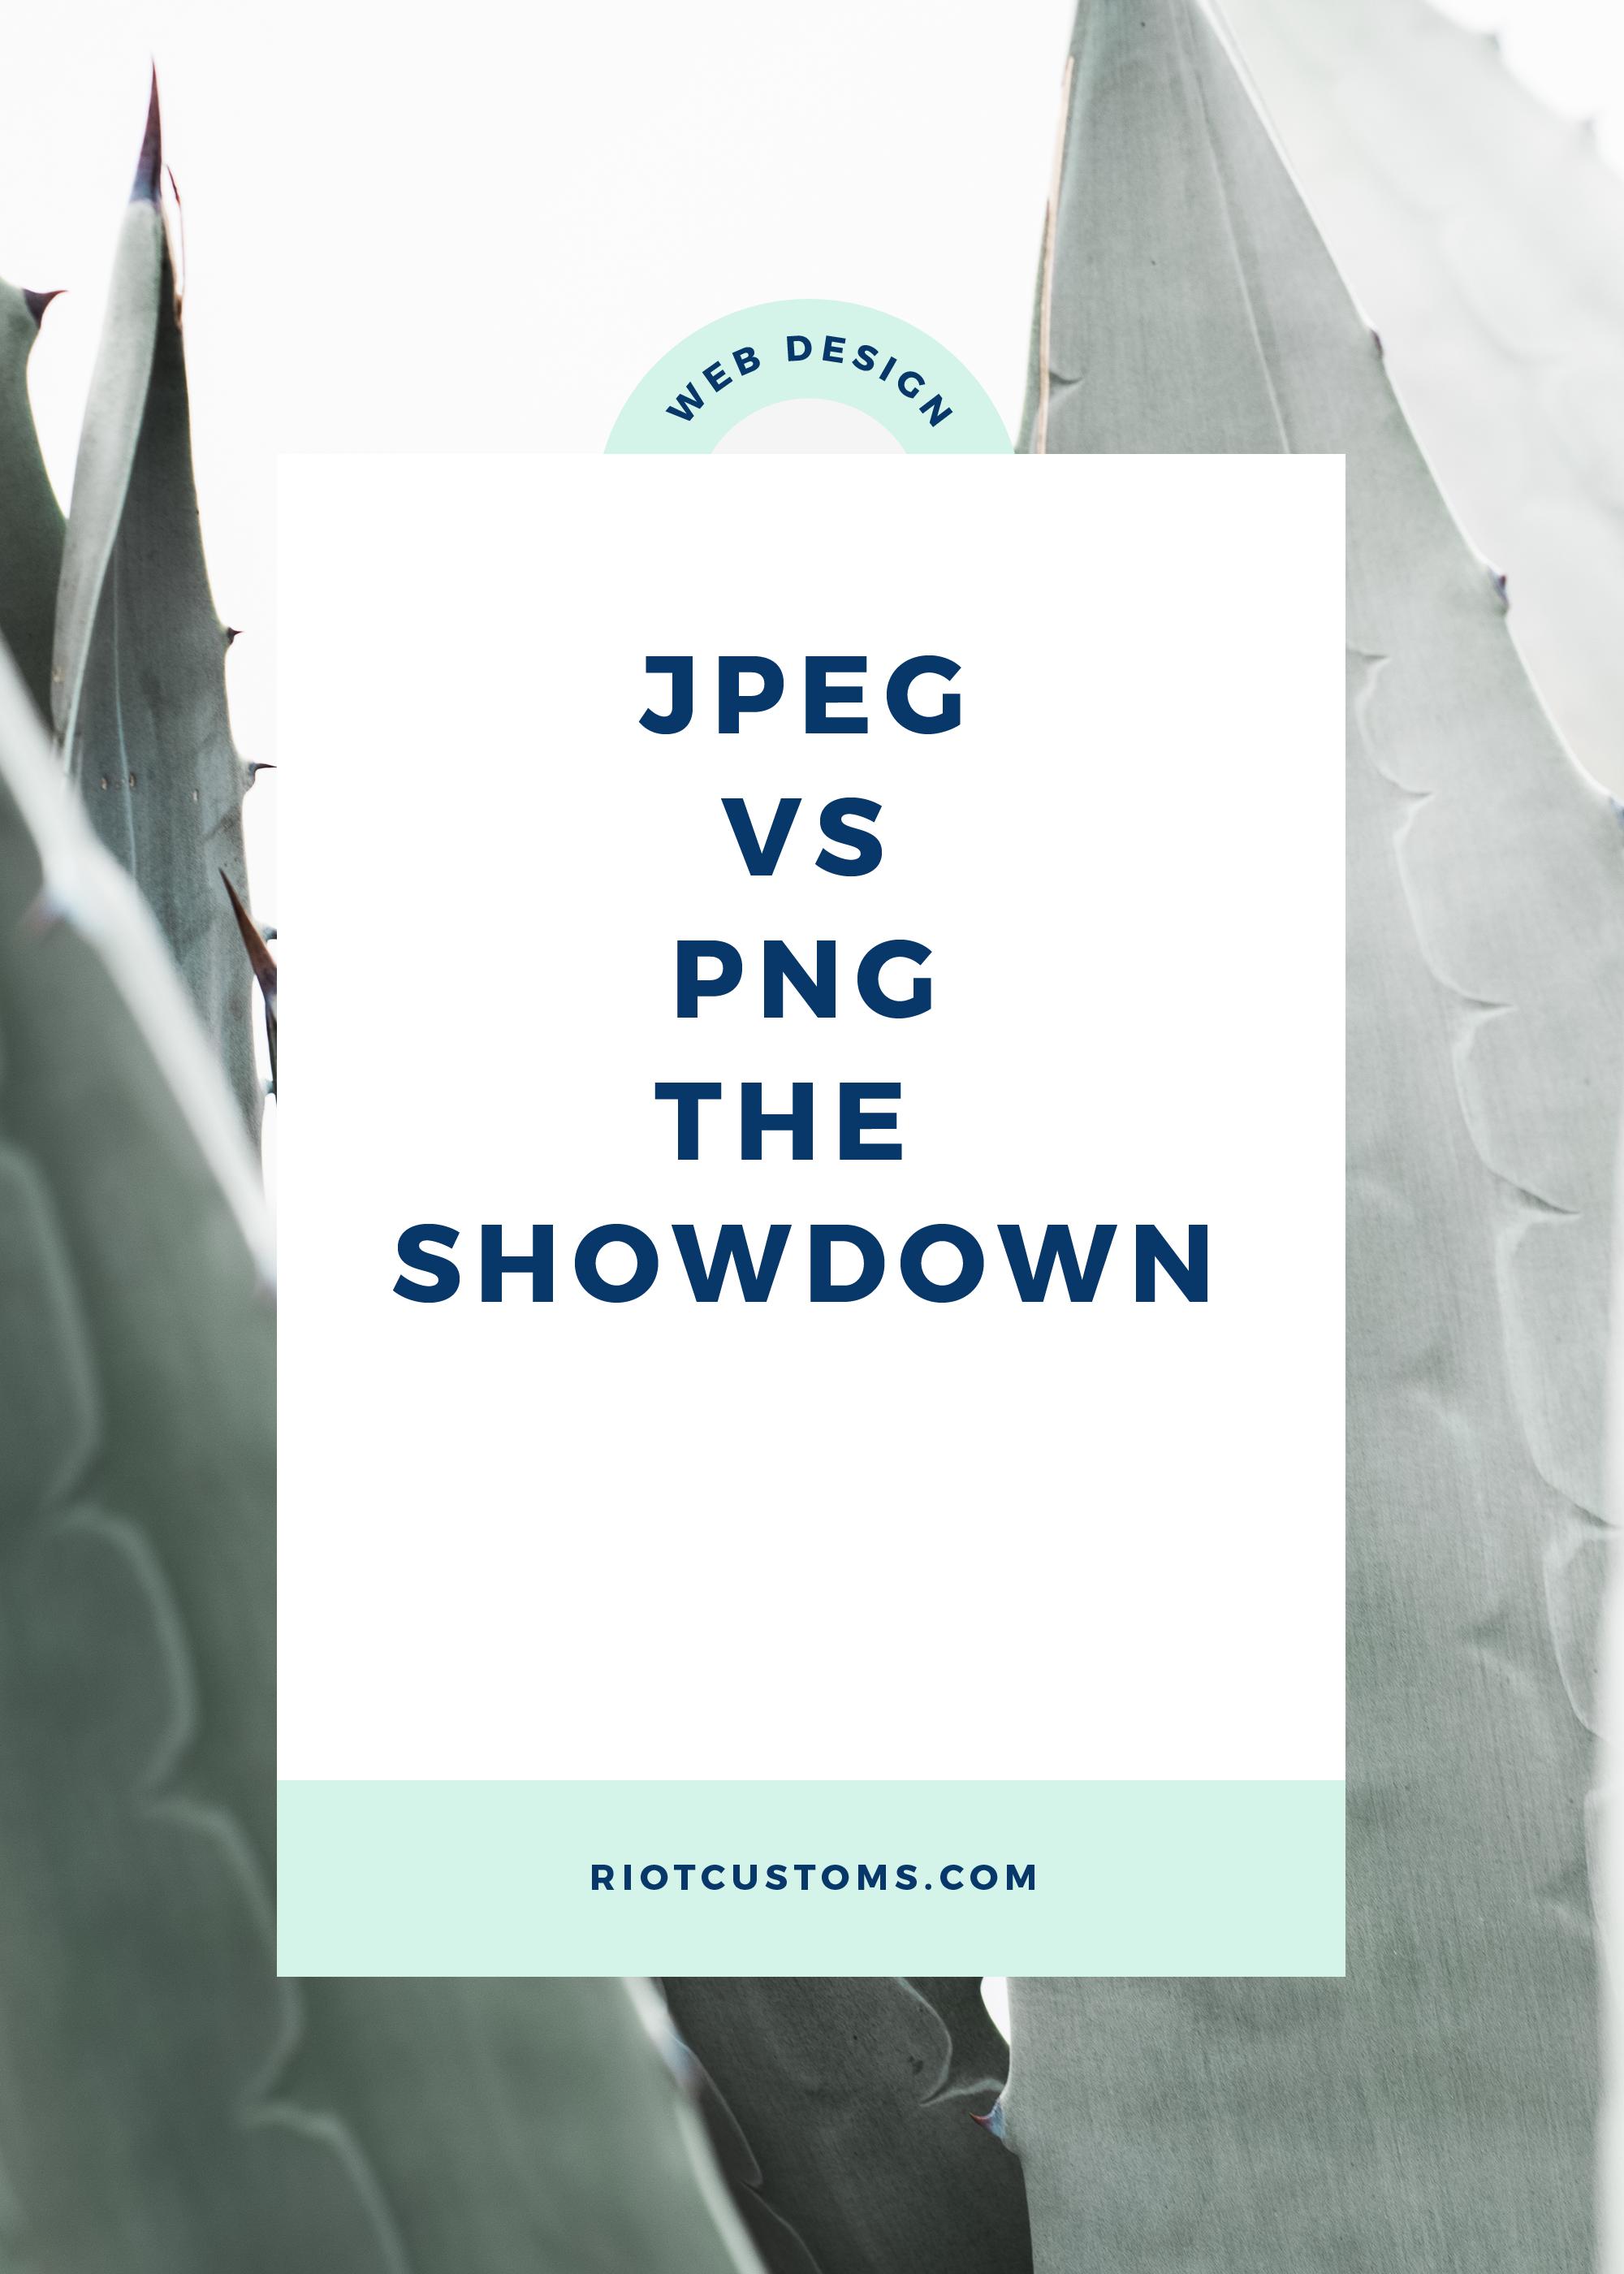 JPEG vs PNG The Showdown.